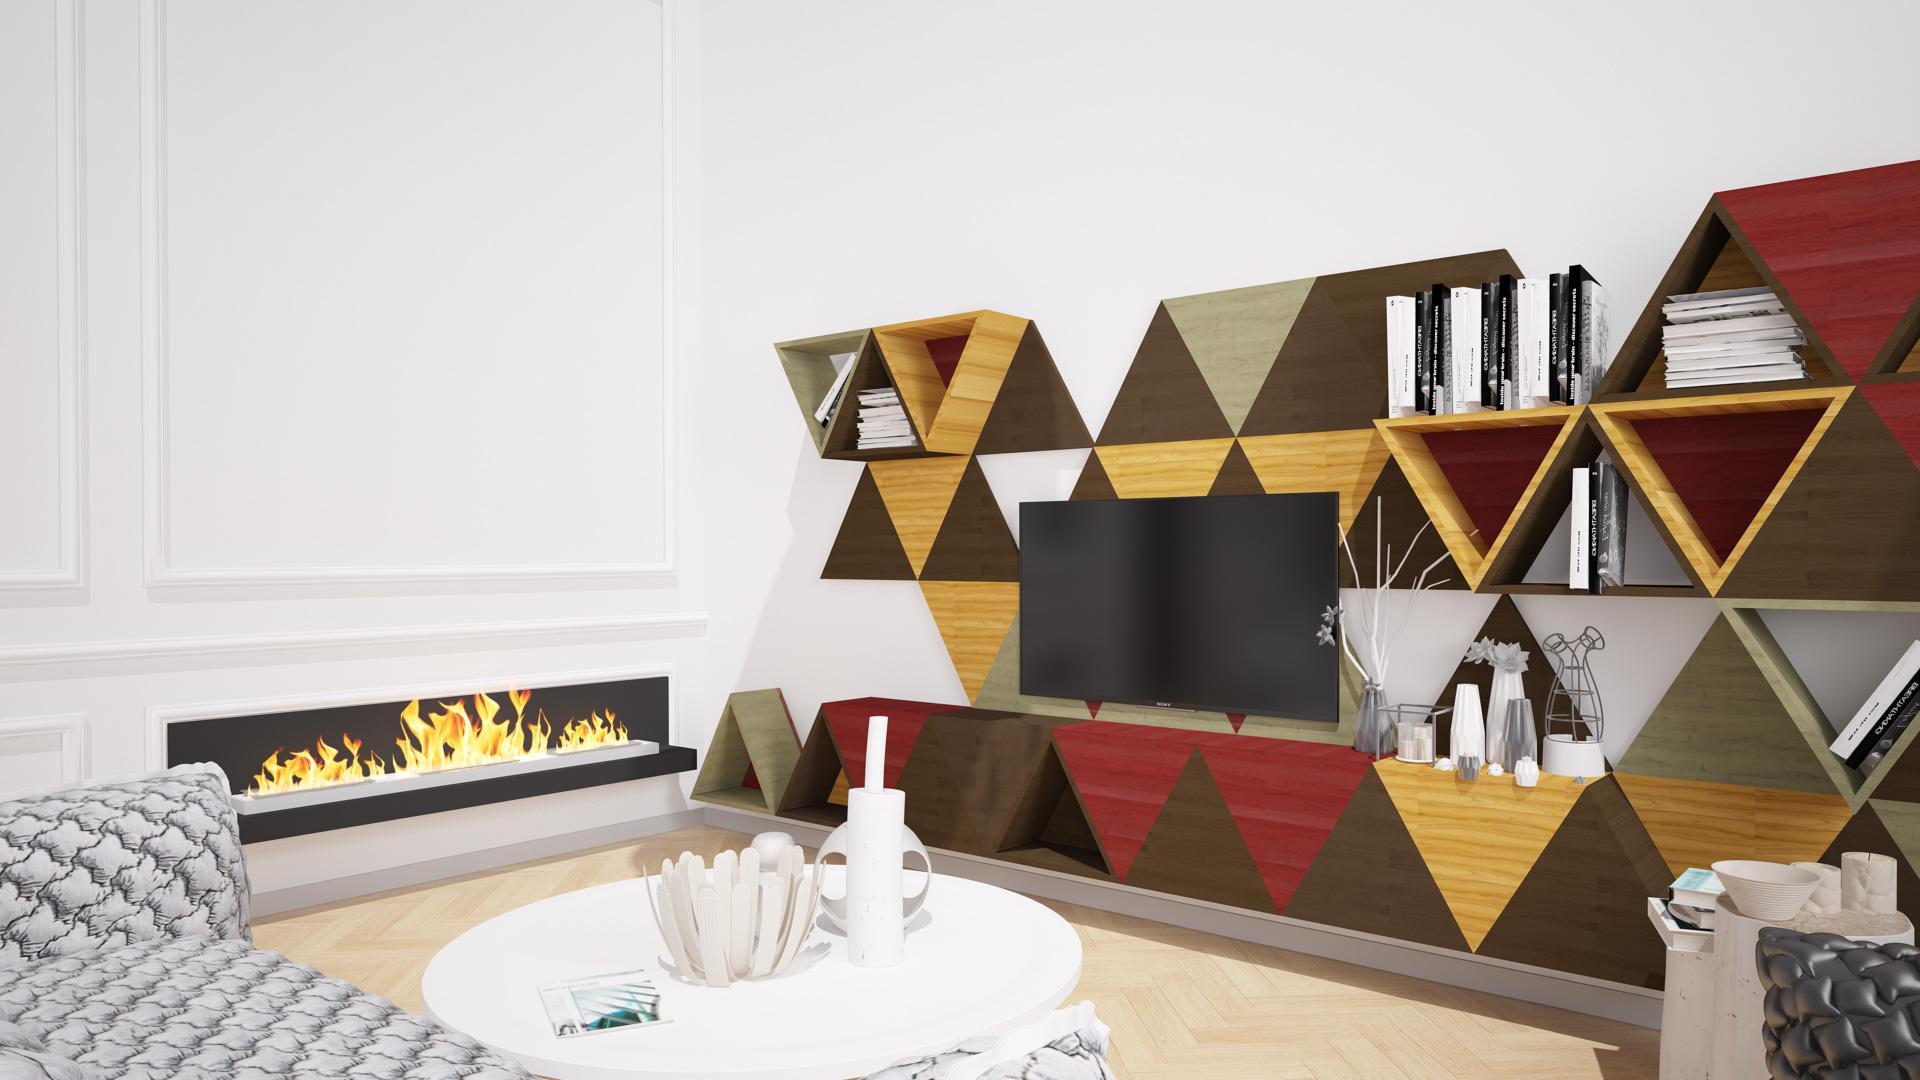 6study-interior-design-slow-wood-designboom